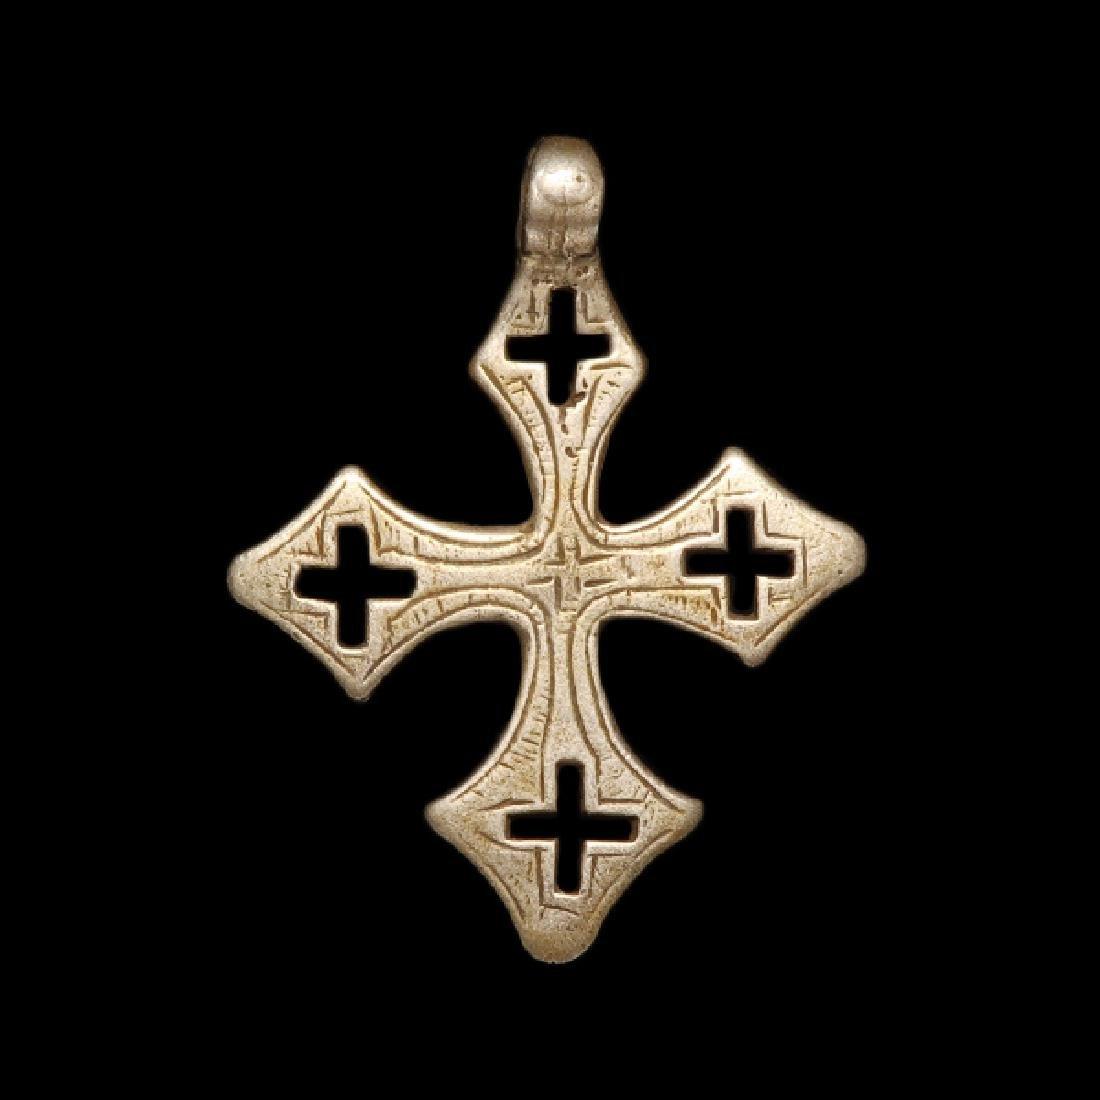 Byzantine Silver Cross, c. 8th-10th Century A.D. - 2